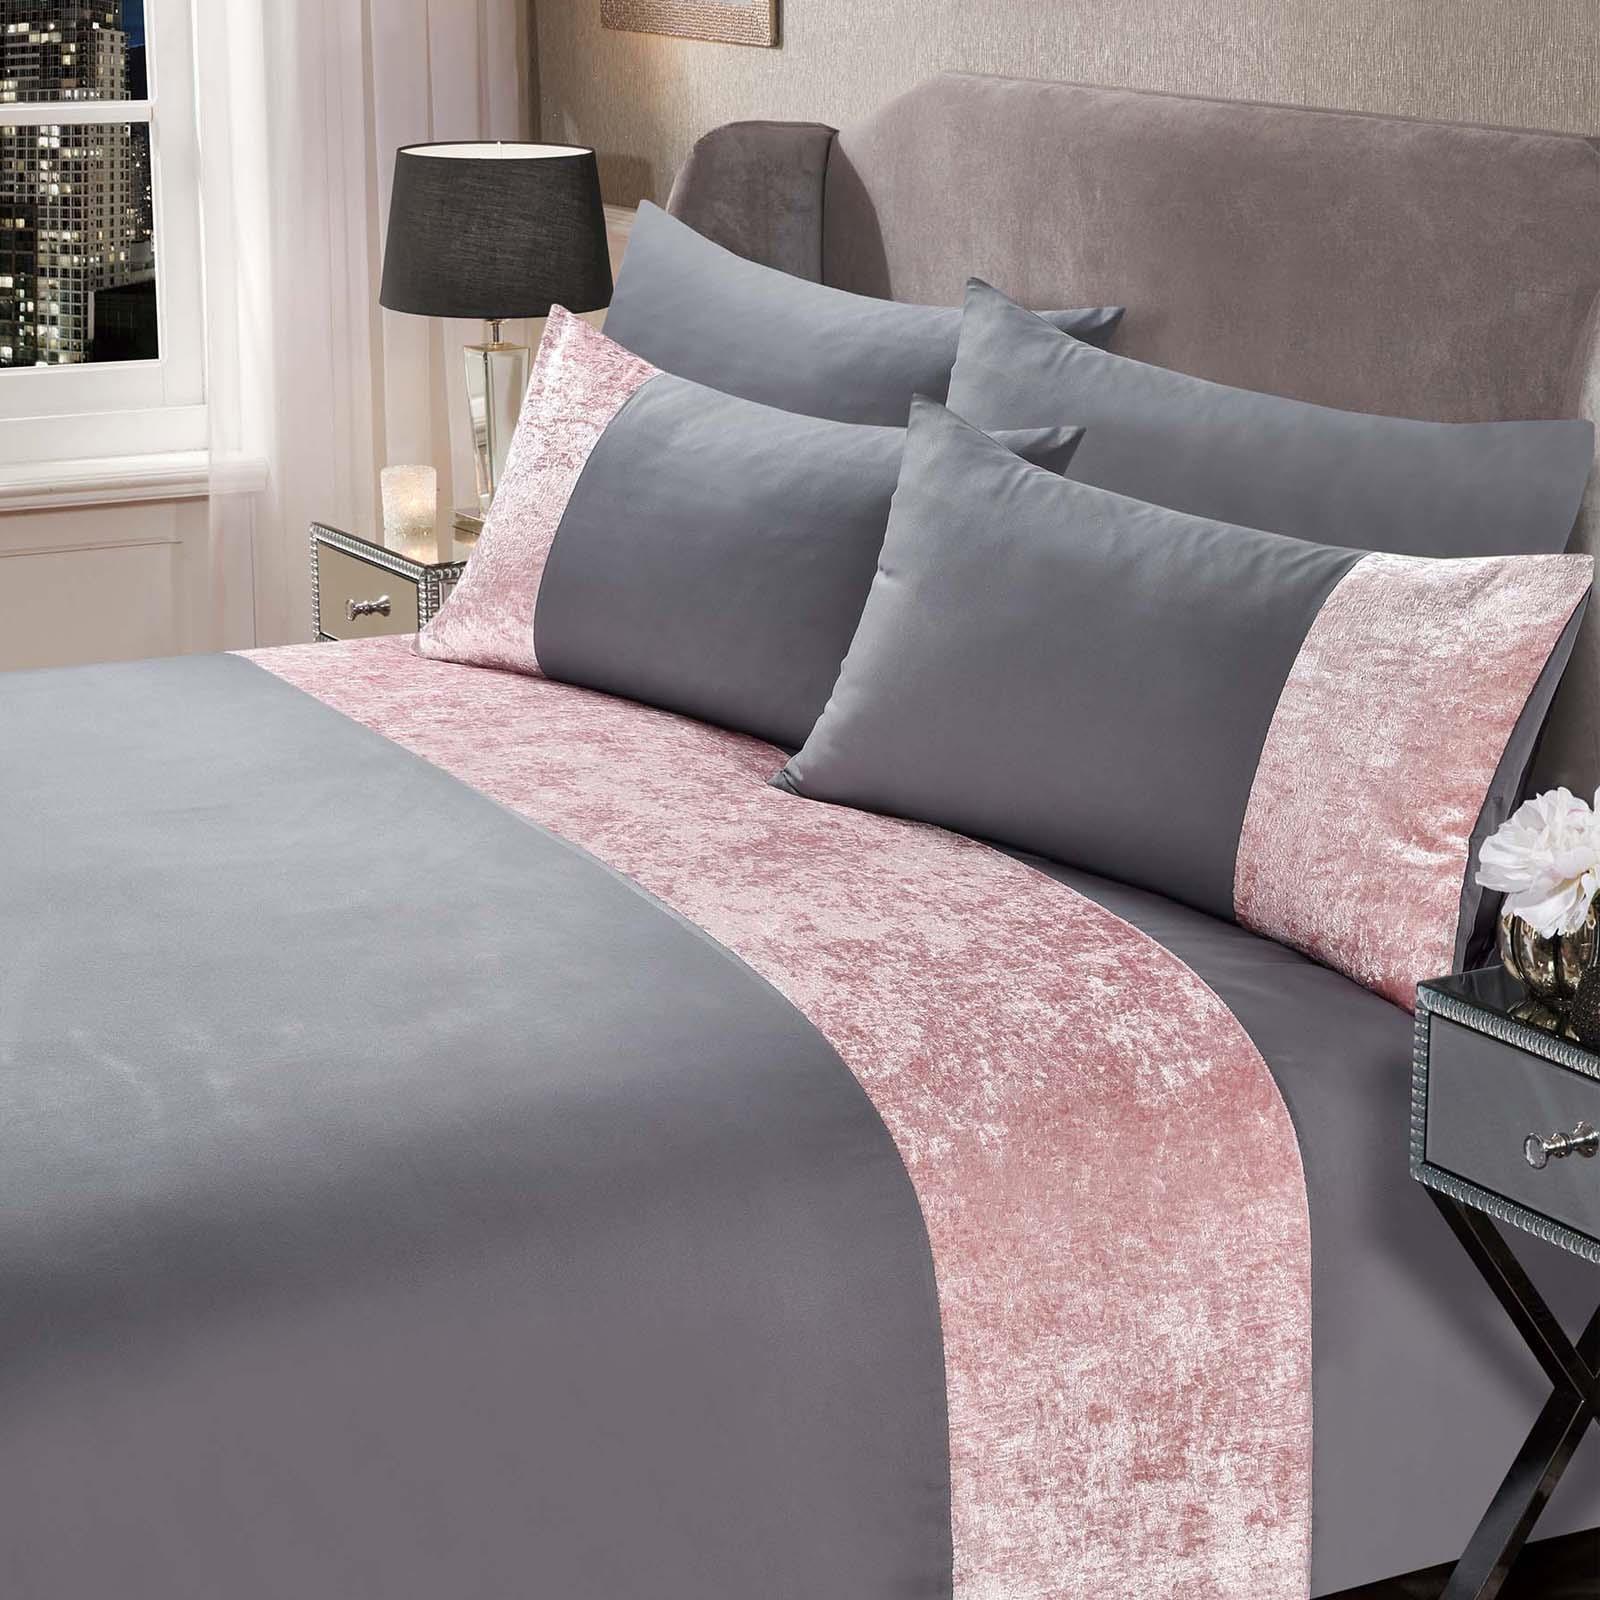 thumbnail 26 - Sienna Crushed Velvet Panel Duvet Cover with Pillow Case Bedding Set Silver Grey